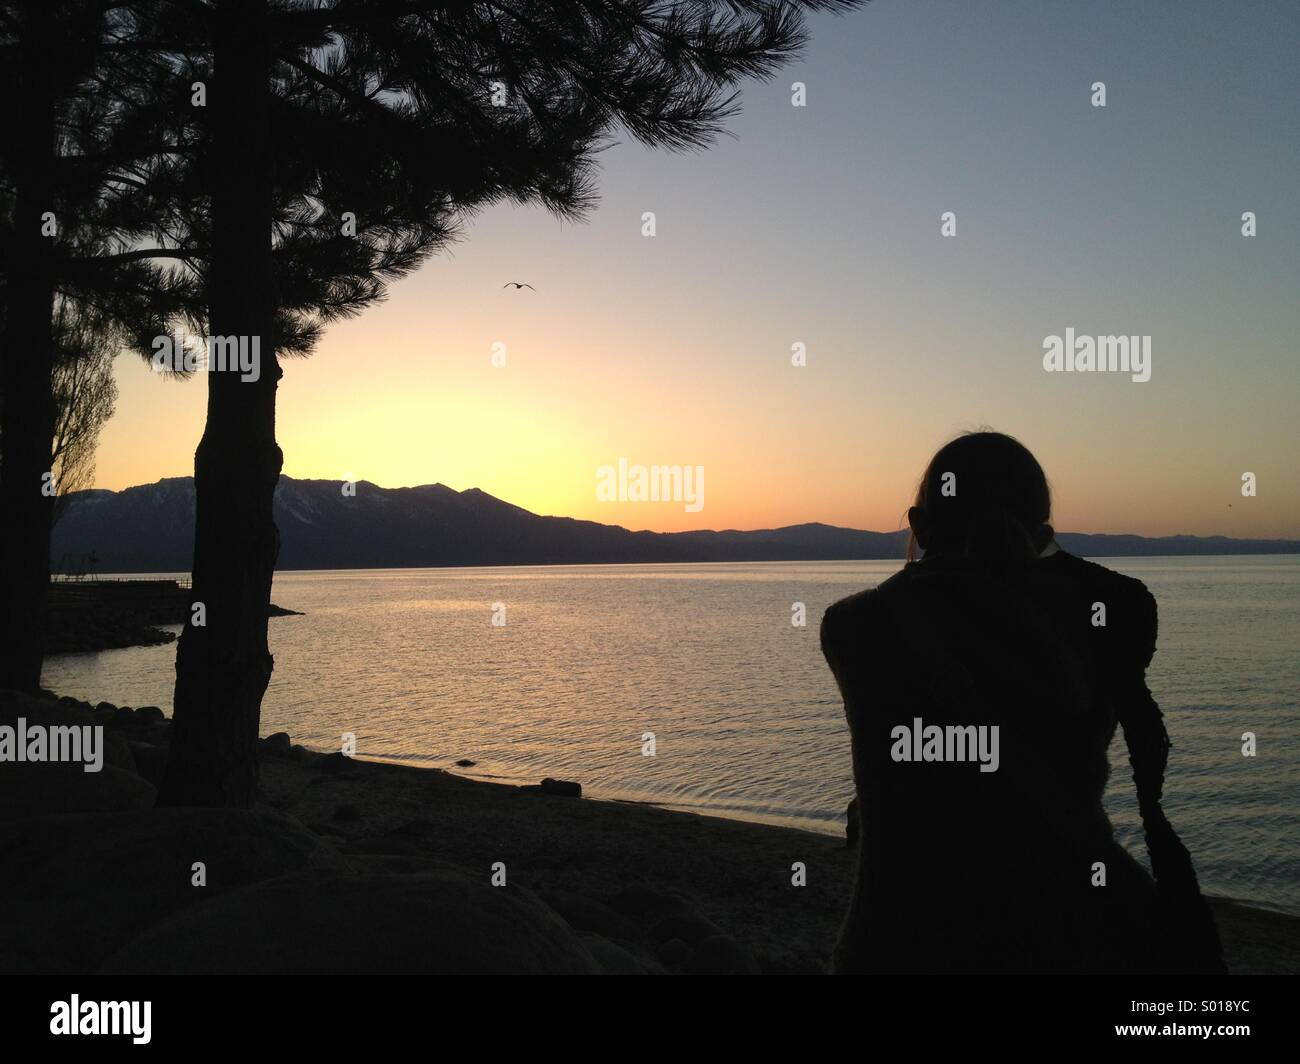 No podía haber planeado este disparo. Un atardecer perfecto en Lake Tahoe Imagen De Stock